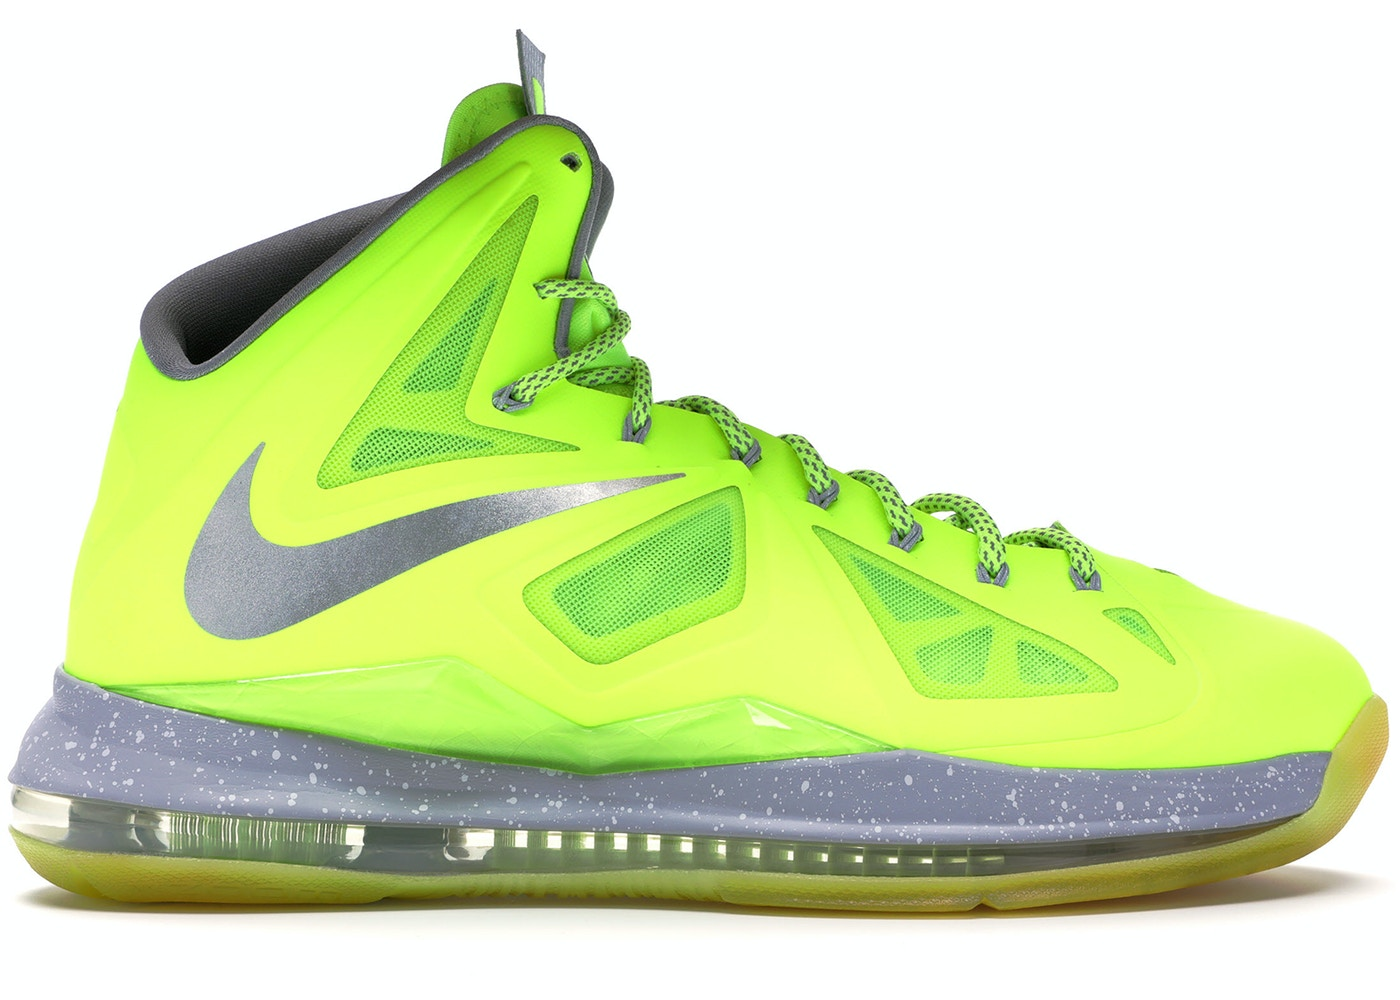 fe721fd95e4 Nike LeBron 10 Shoes - Price Premium